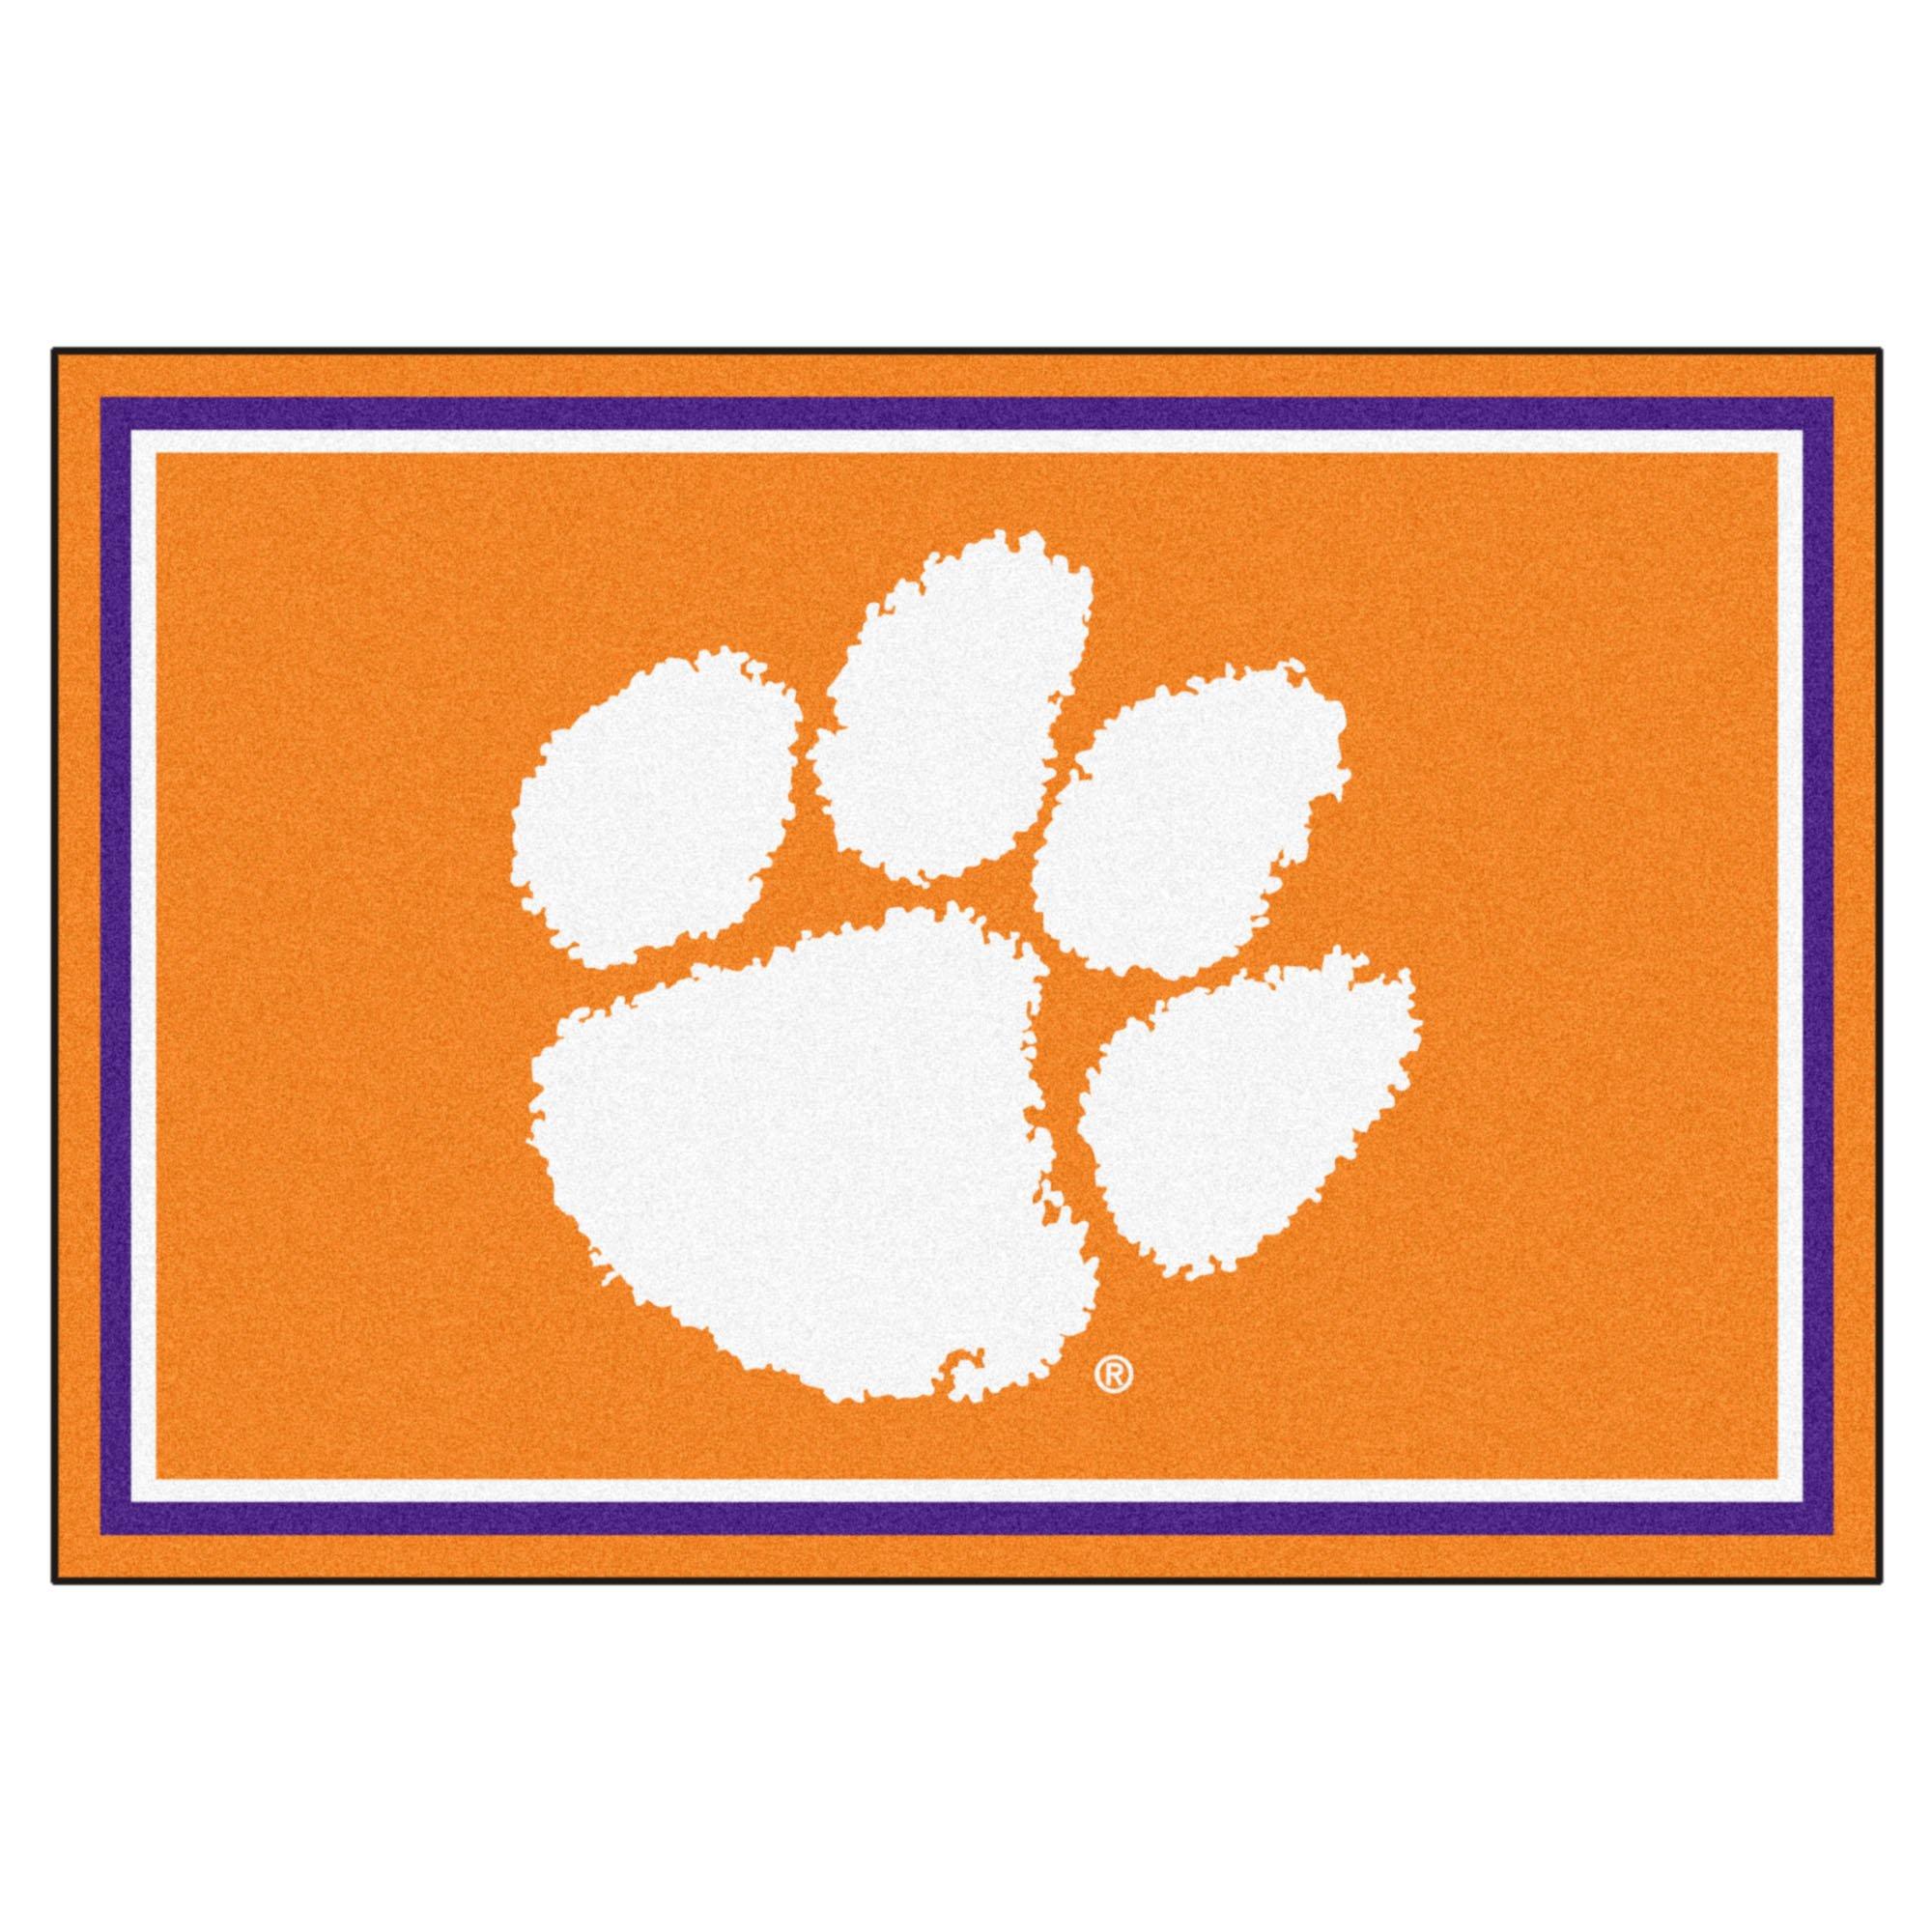 FANMATS NCAA Clemson University Tigers Nylon Face 5X8 Plush Rug by Fanmats (Image #1)